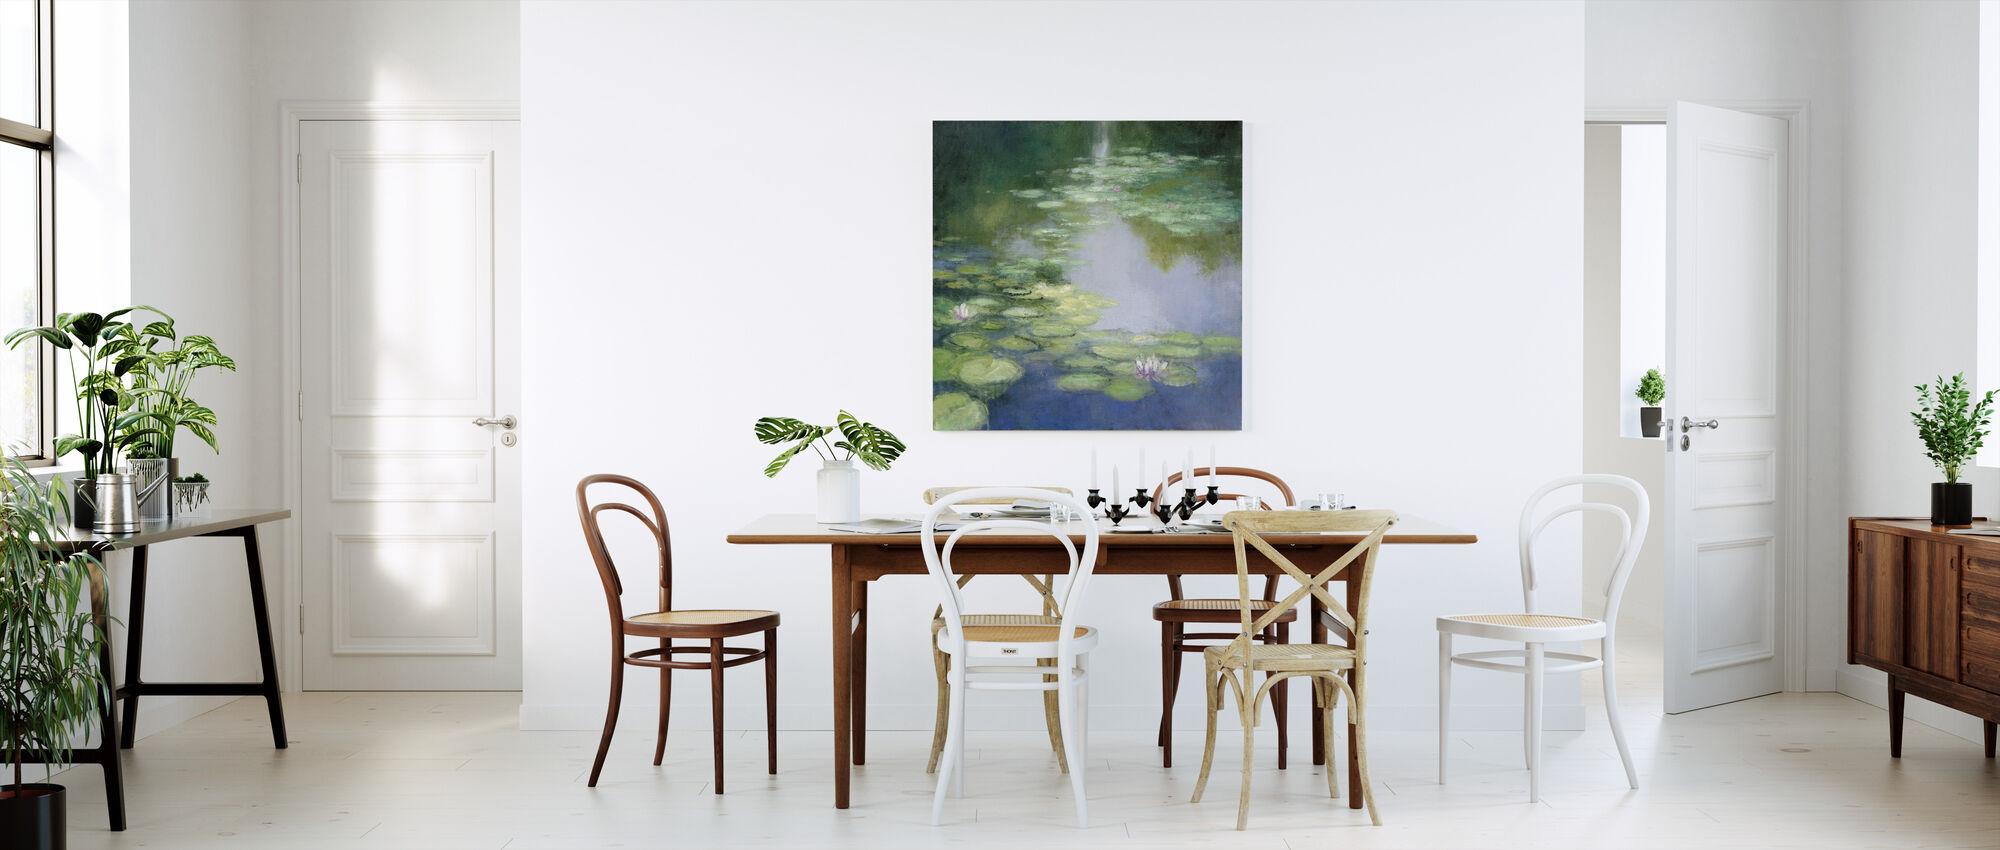 Blue Lily I - Canvas print - Kitchen